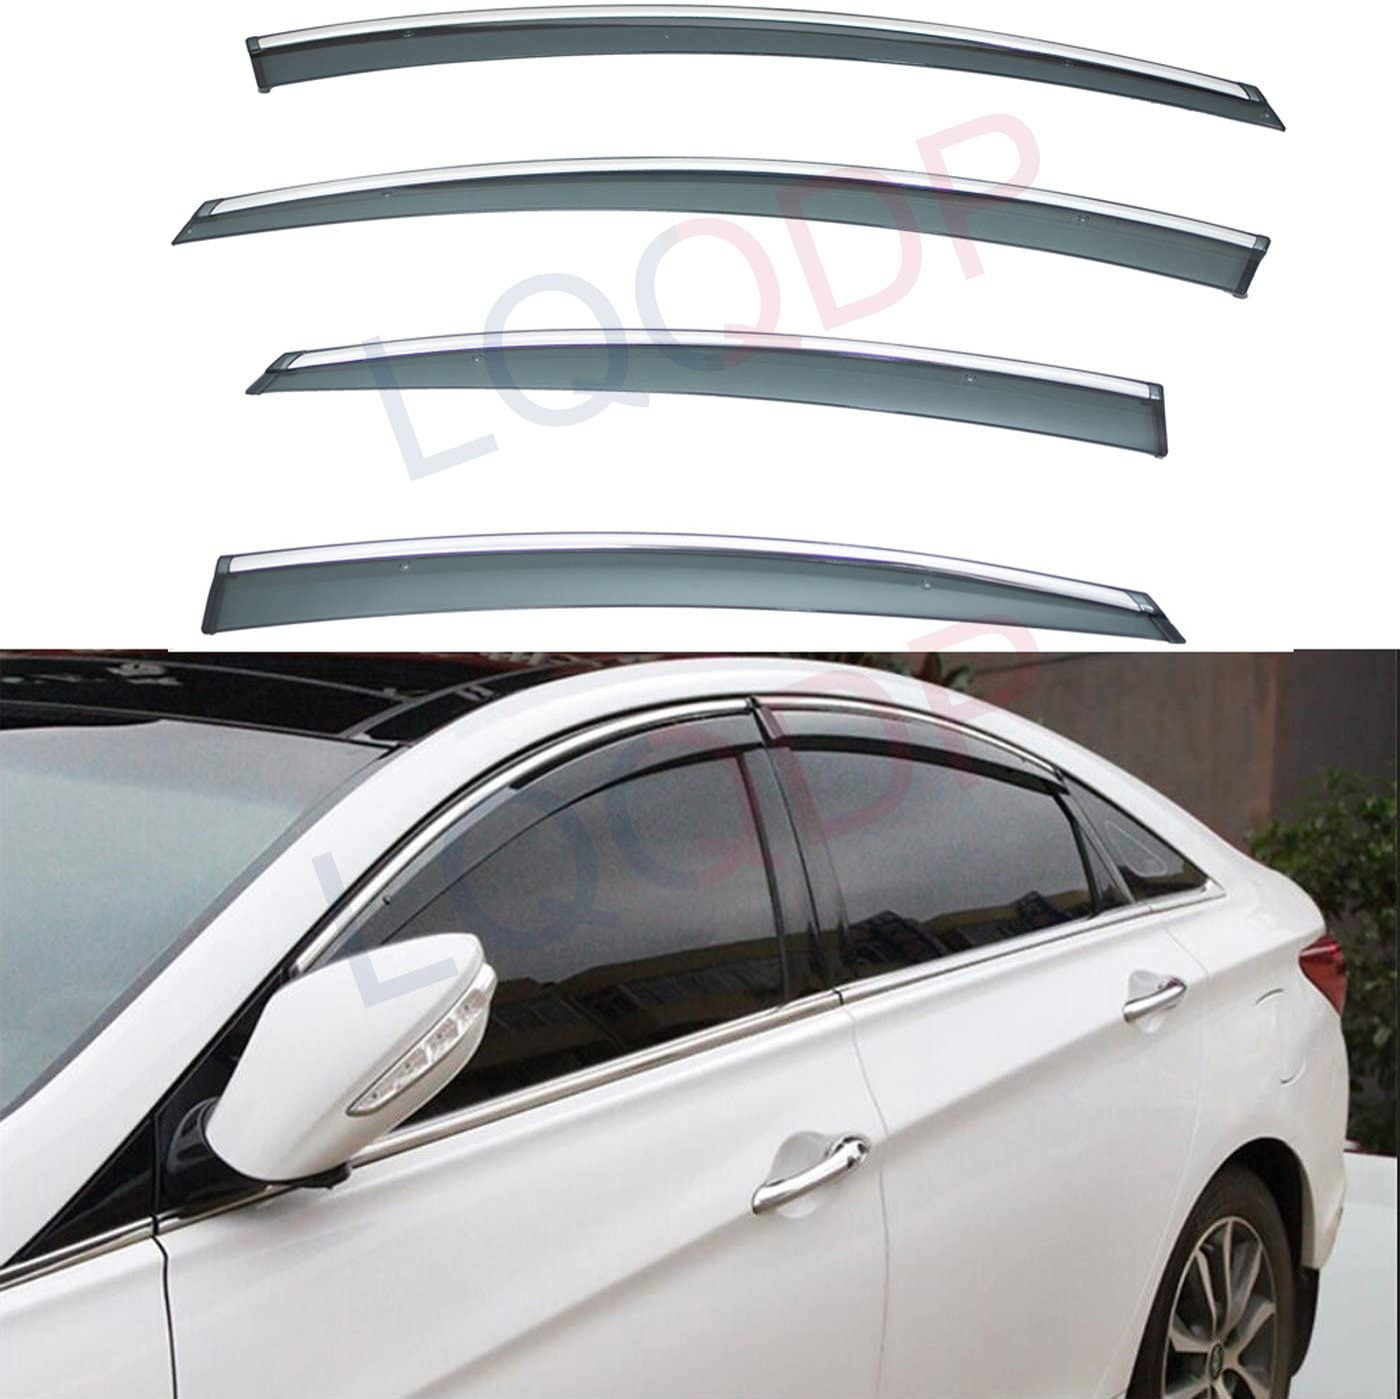 Amazon Com Lqqdp 4pcs Smoke Tint With Chrome Trim Outside Mount Tape On Clip On Style Pvc Sun Rain Guard Vent Shade Window Visors Fit 11 14 Hyundai Sonata I45 Yf 15 Hybrid Automotive